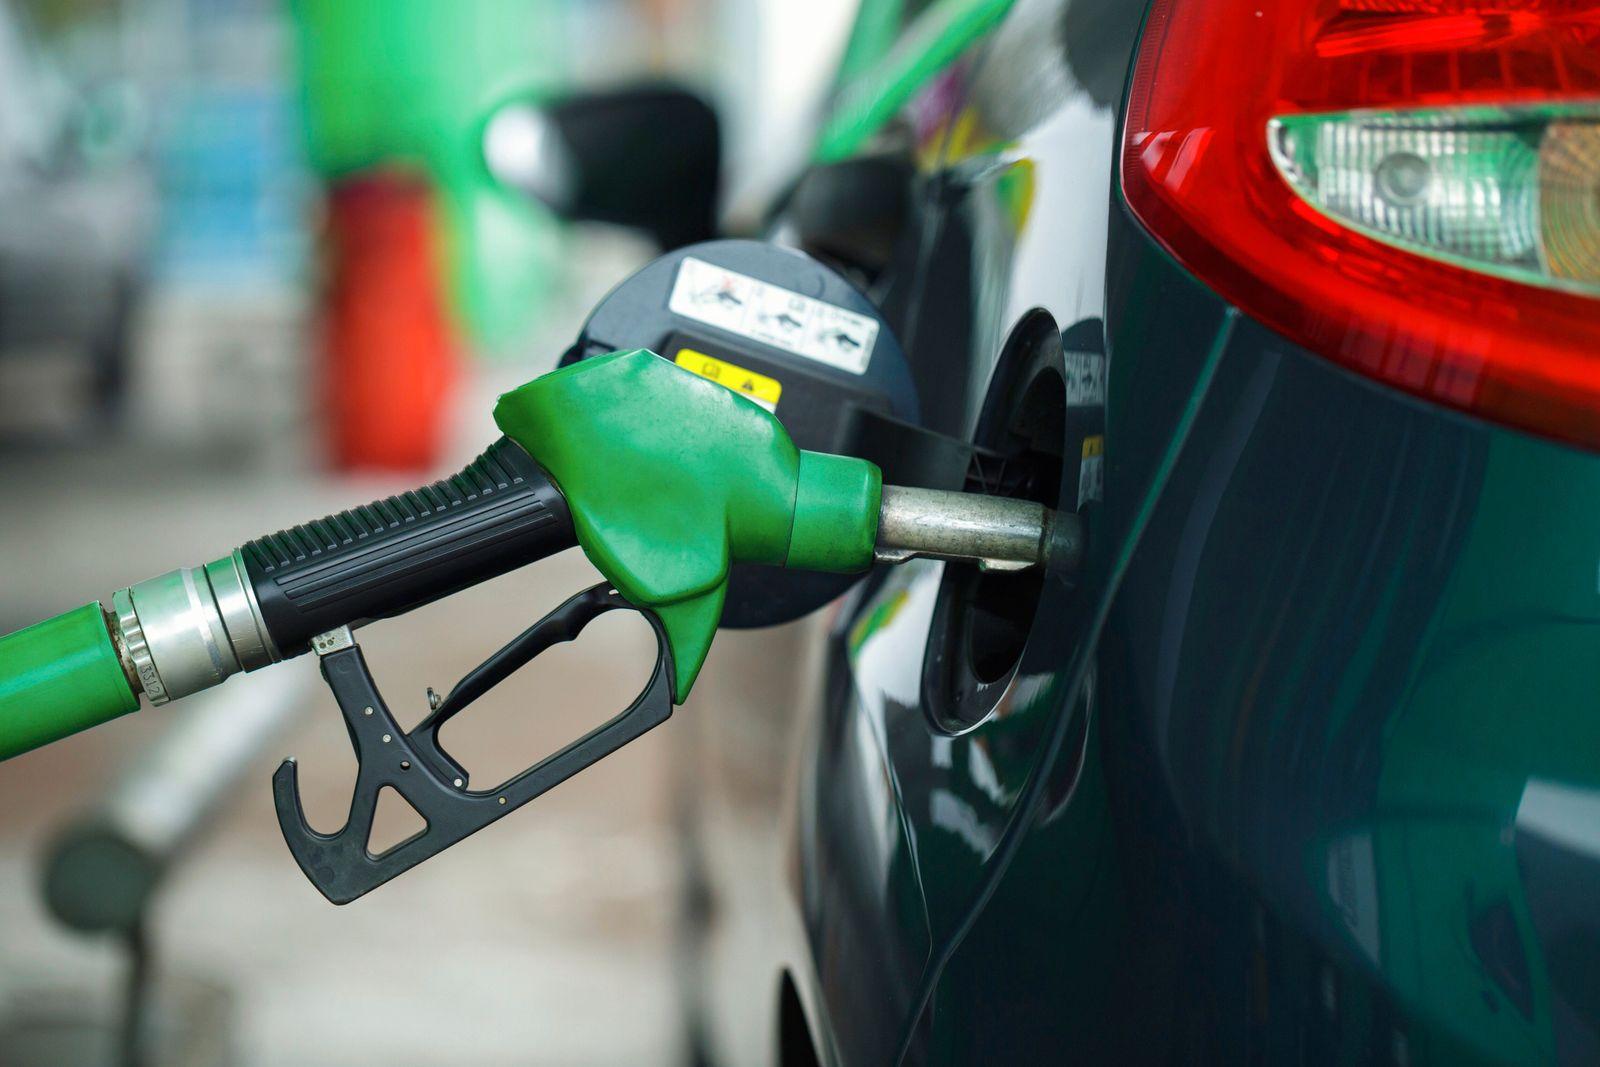 Car refueling on a petrol station in winter closeup (vladstar)